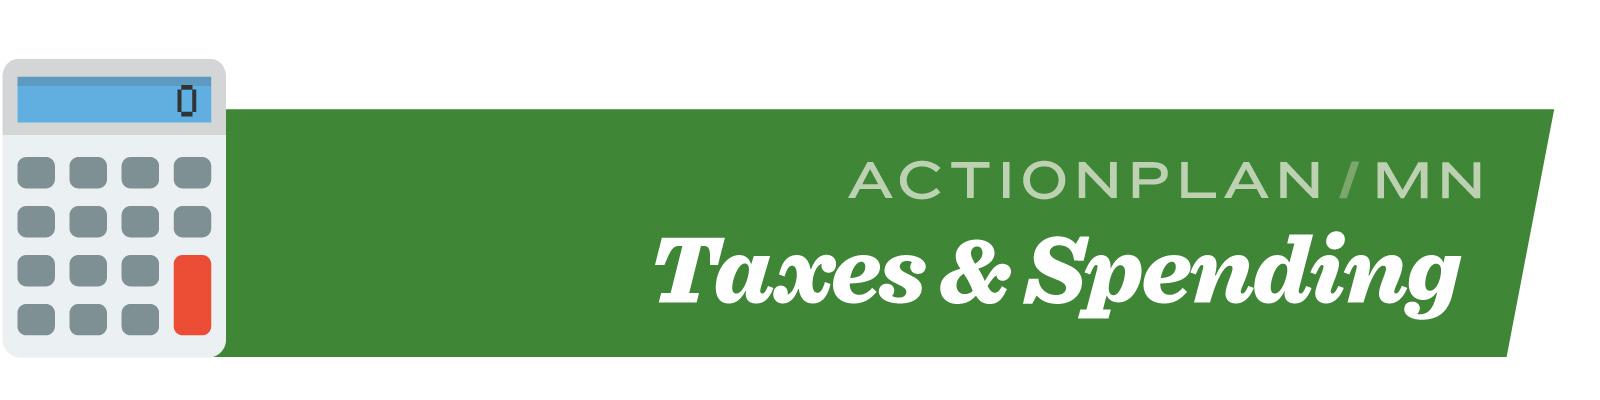 ActionPlanMN-2-Taxes-Spending.jpg